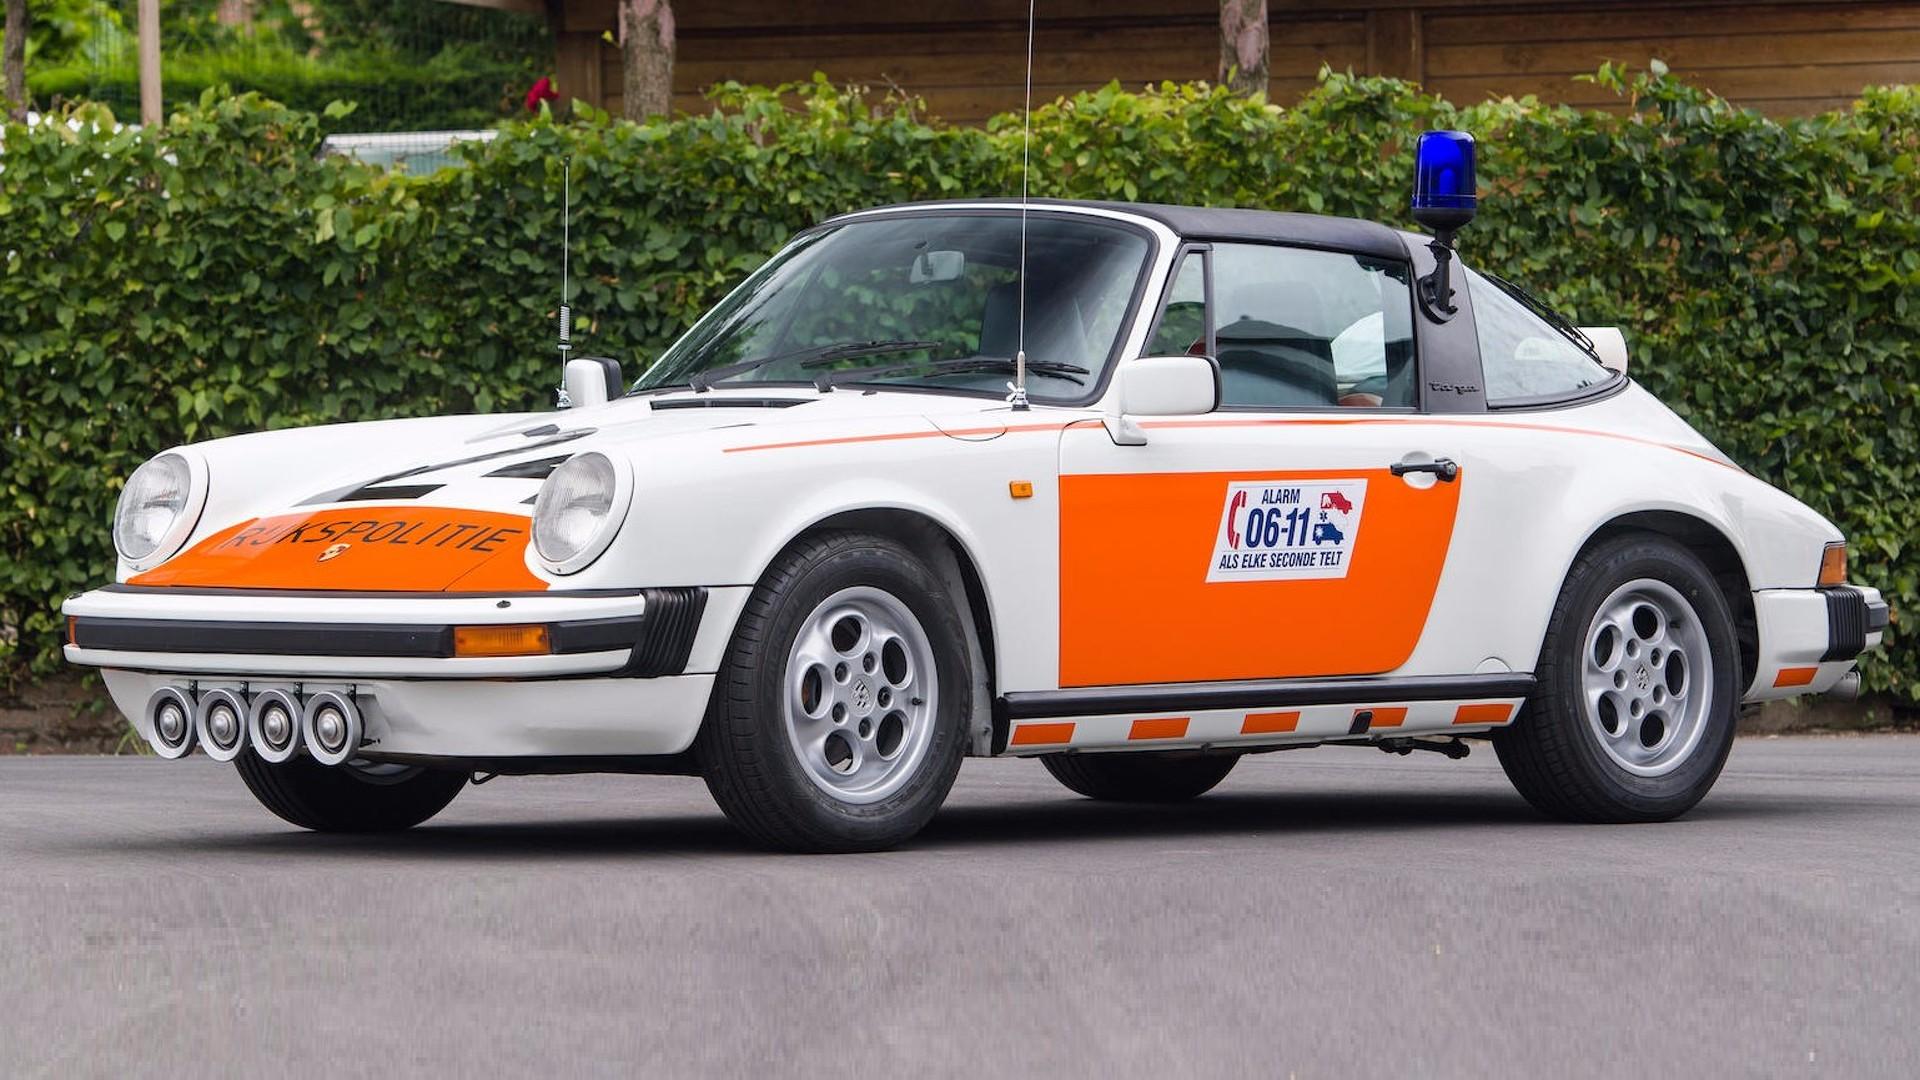 1989 Porsche 911 Targa Dutch police car up for auction